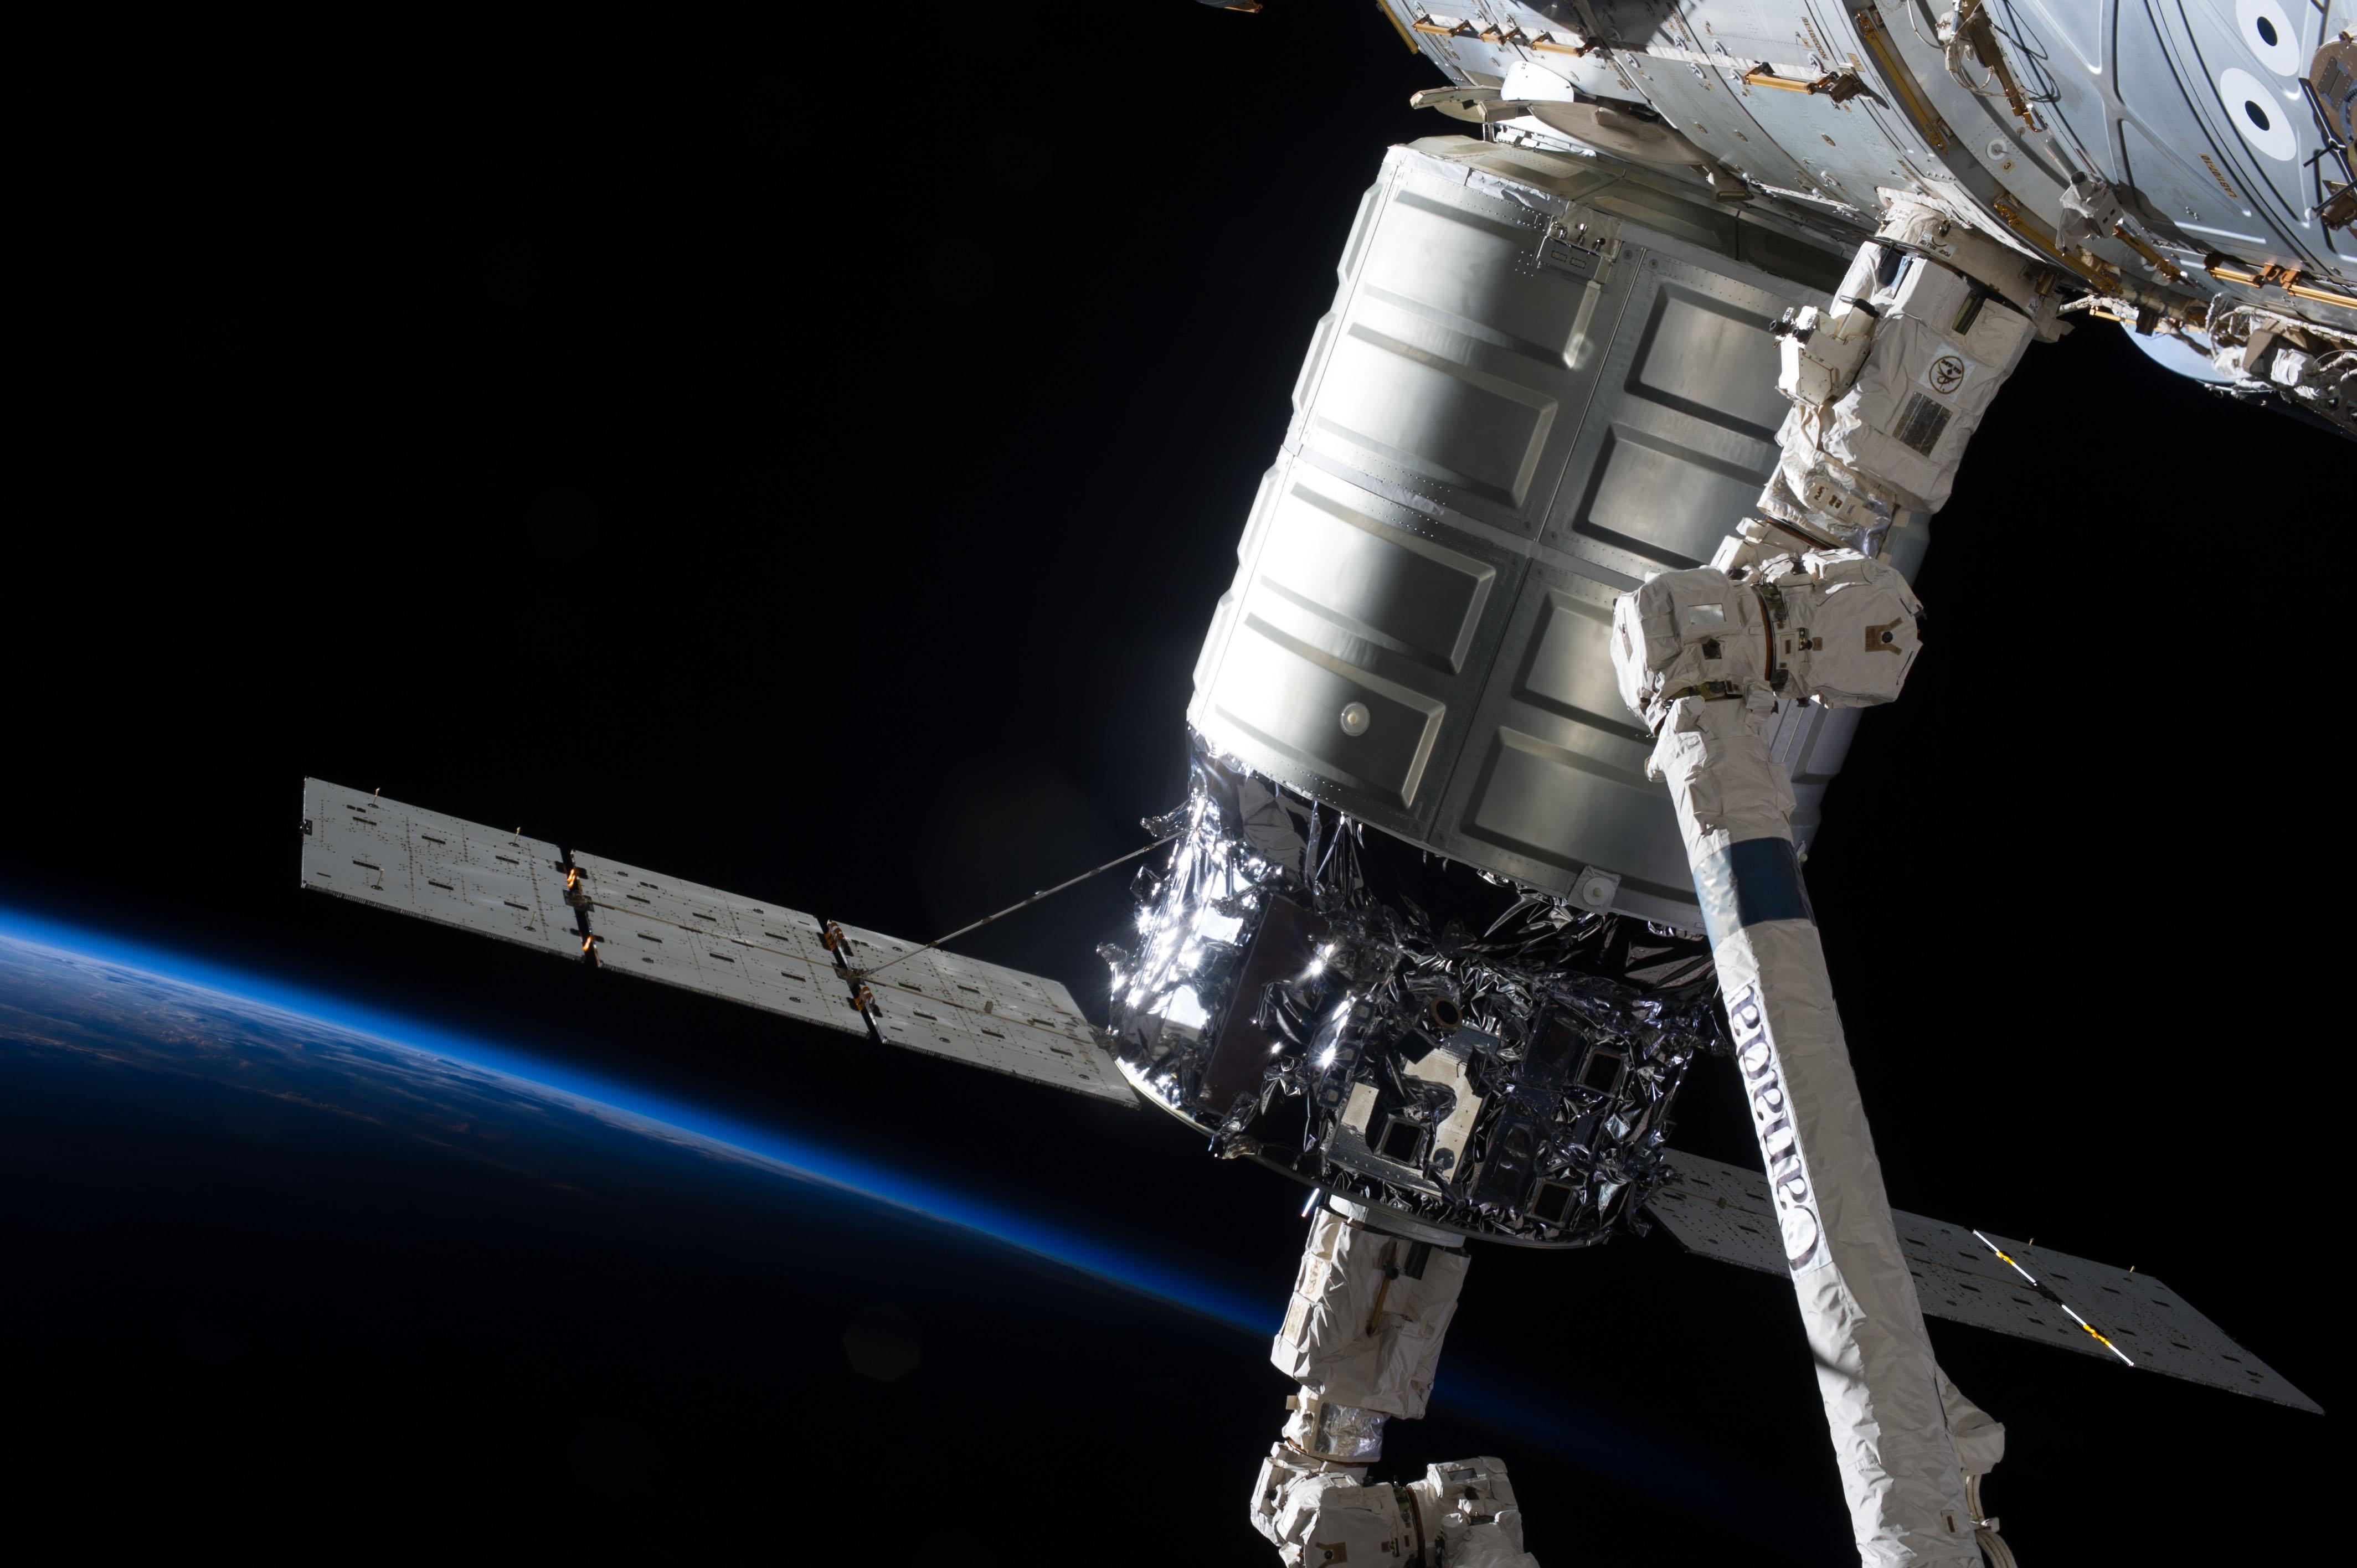 Cygnus in the Grasp of the Canadarm2 | NASA